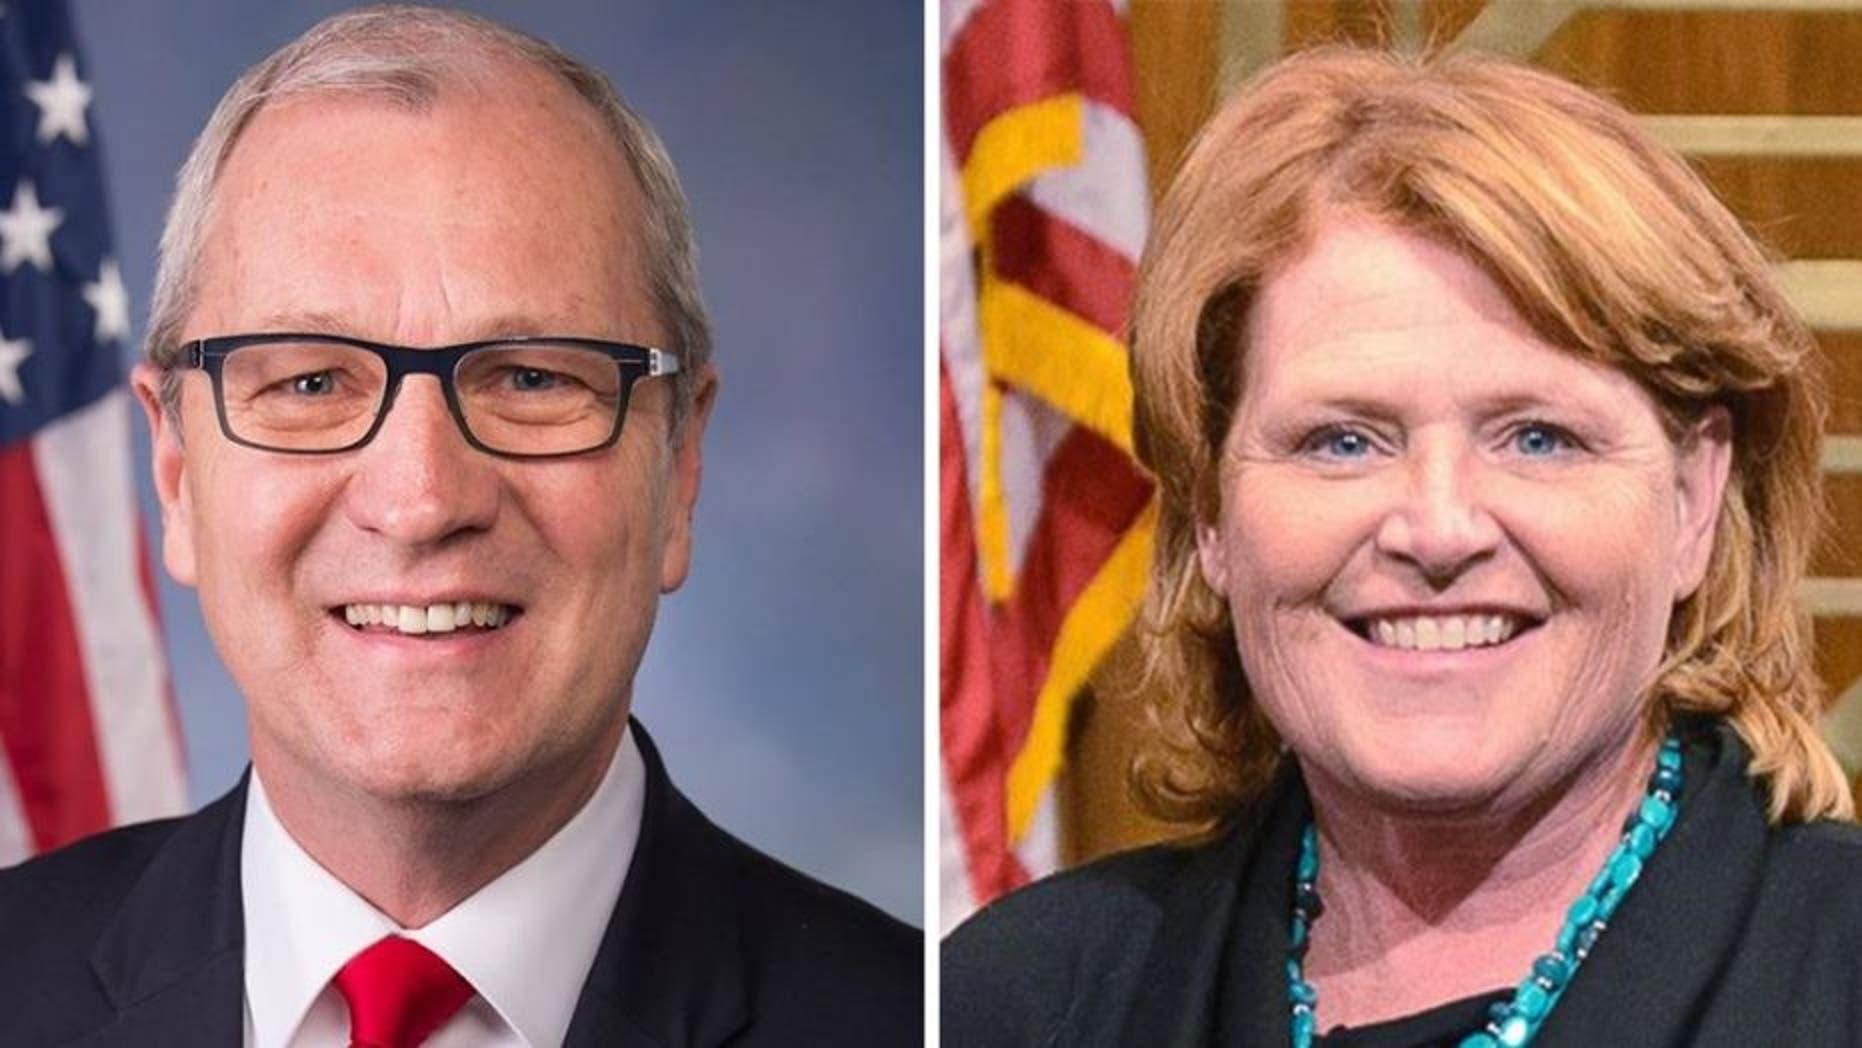 Rep. Kevin Cramer, R-N.D., tops incumbent Democrat Sen. Heidi Heitkamp among North Dakota likely voters by 48-44 percent, in a Fox News poll.